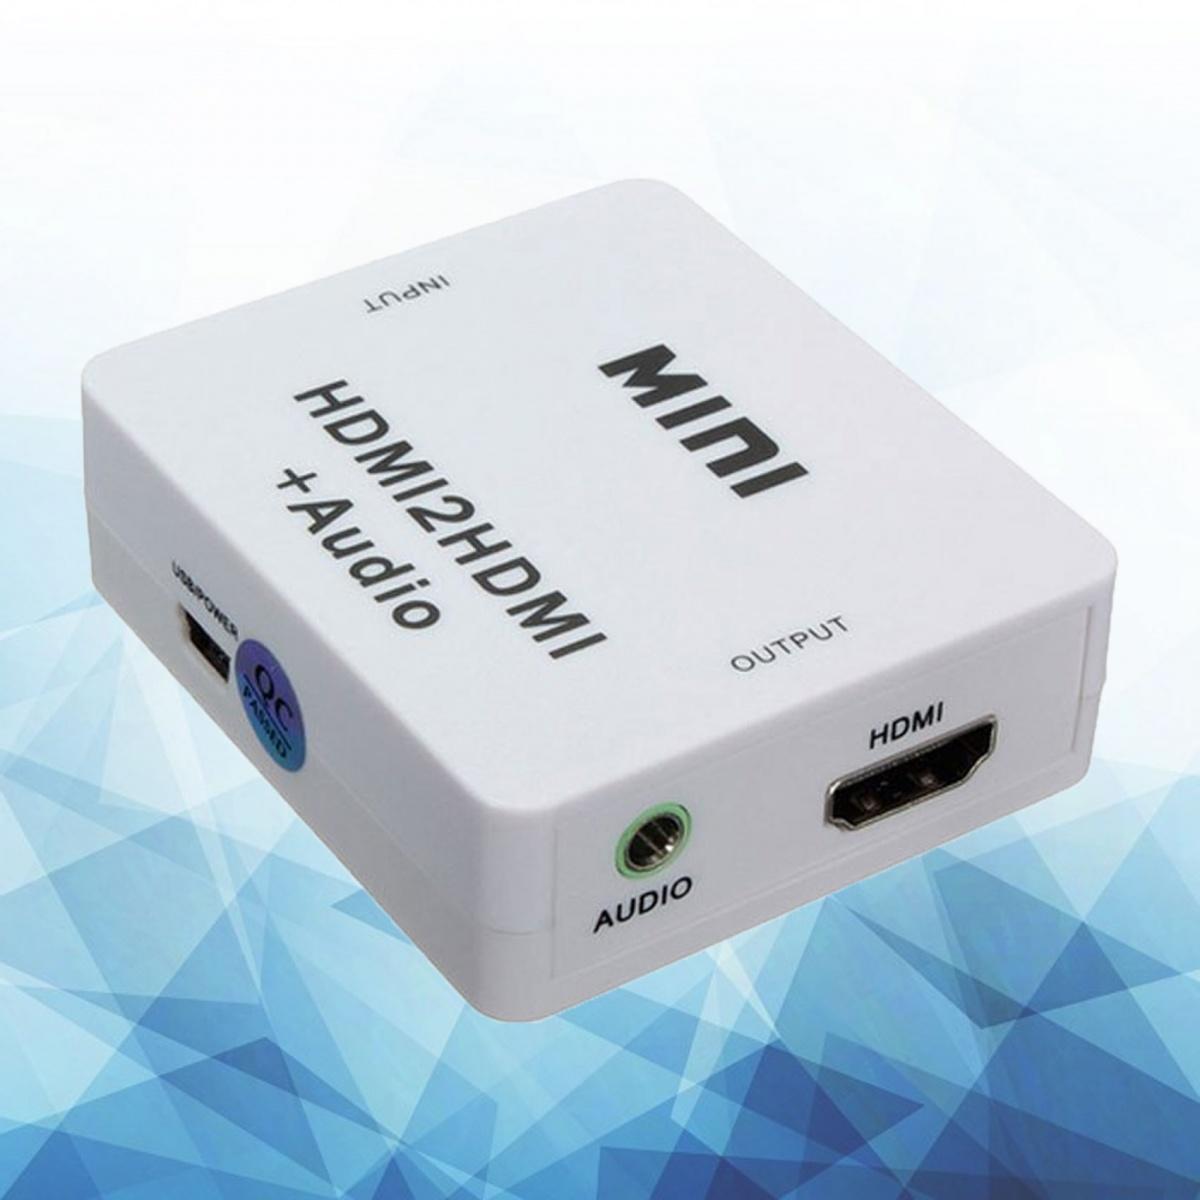 MINI HDMI to HDMI+Audio HDMI To HDMI And 3.5mm Audio Splitter - White